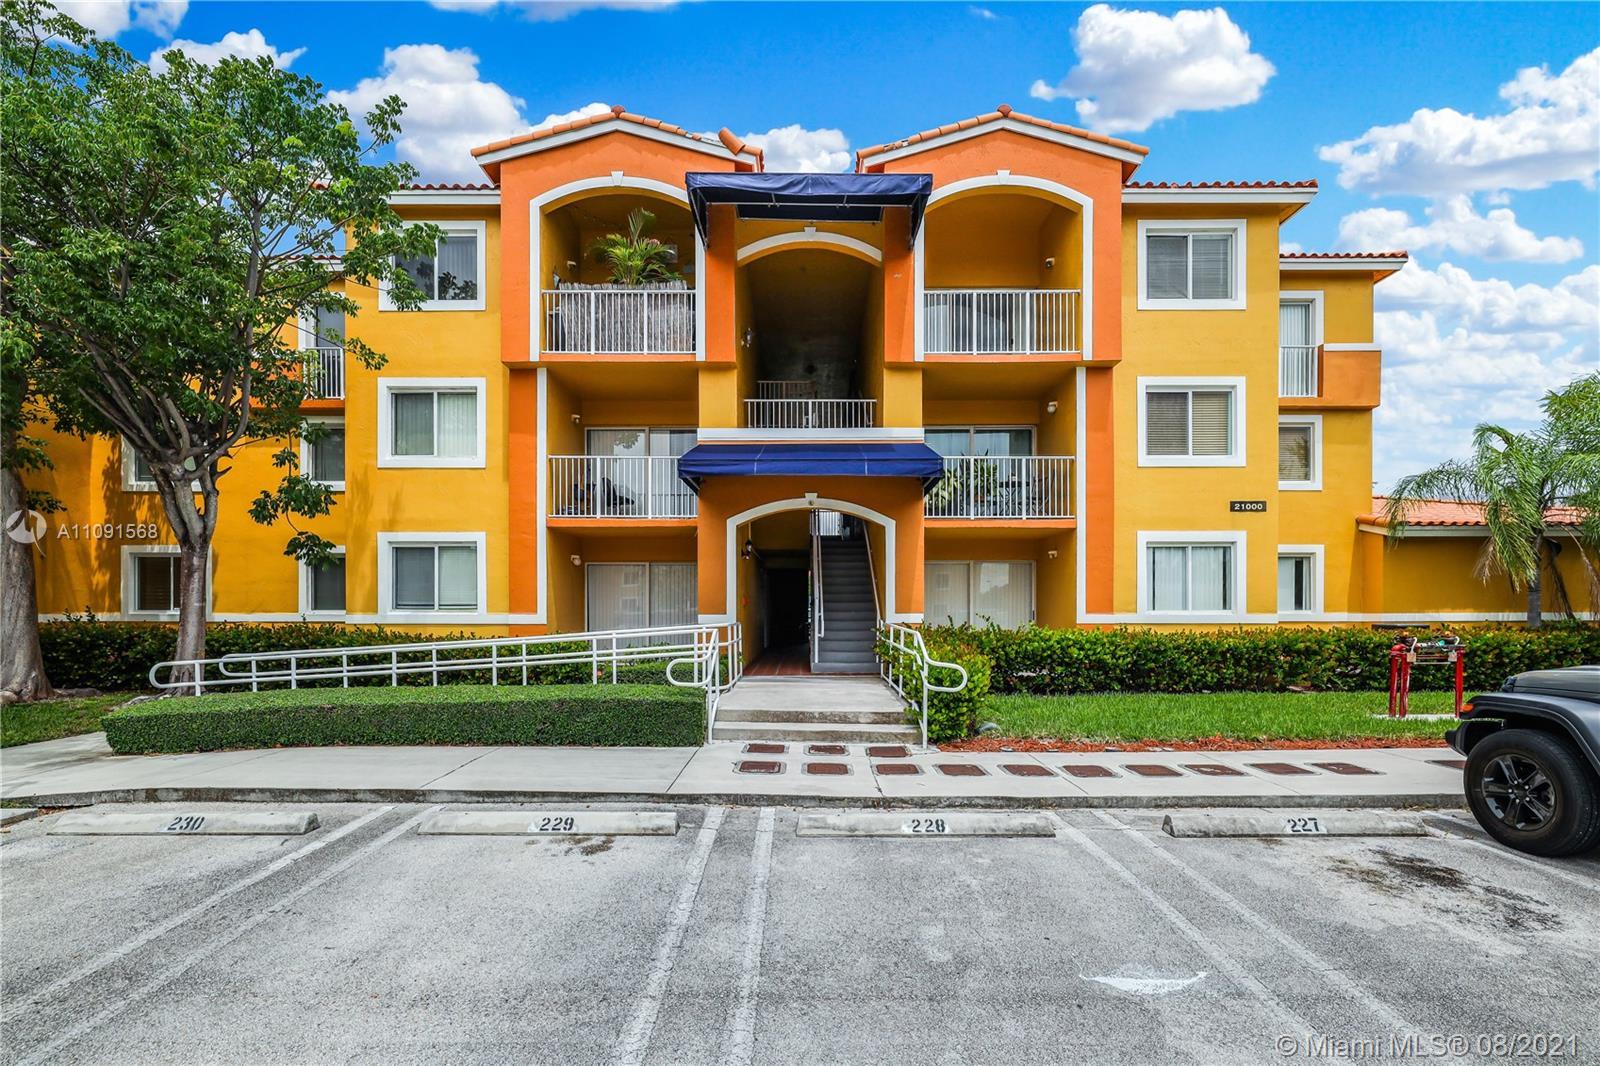 21000 87th Ave Unit 306, Cutler Bay, Florida 33189